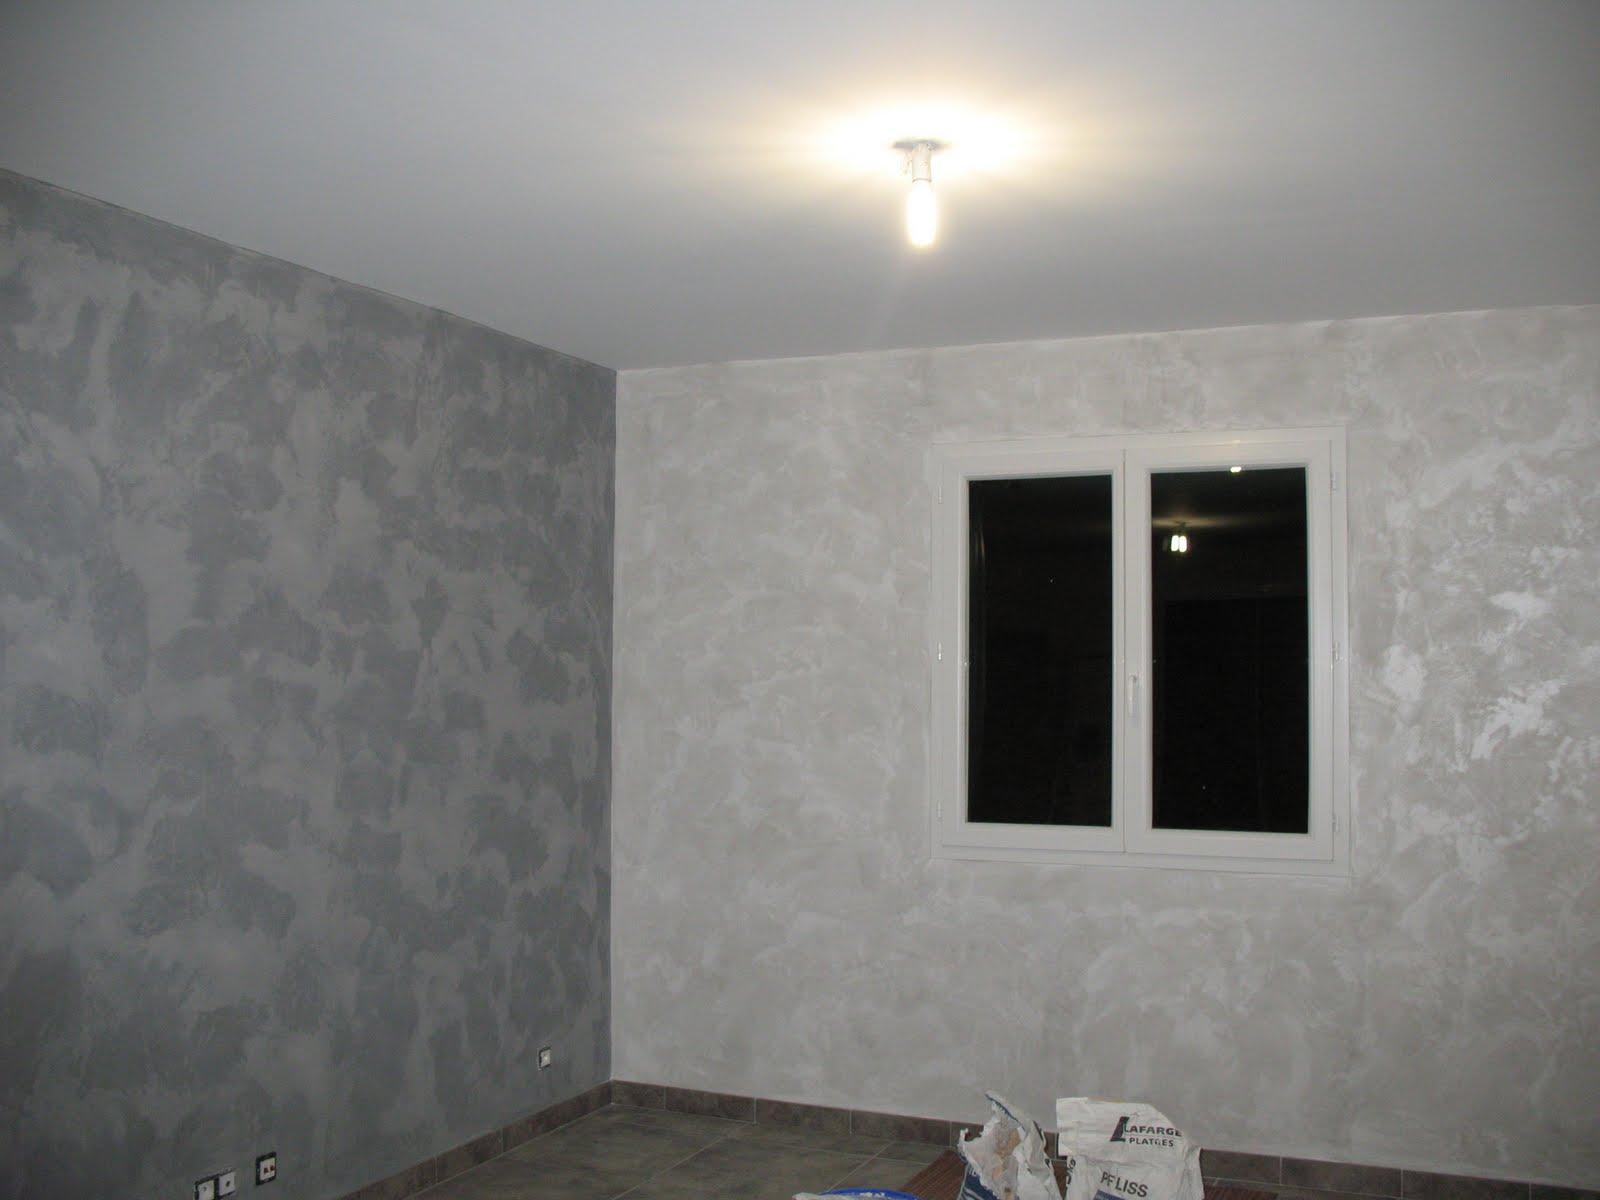 un joli nid peinture acte 2. Black Bedroom Furniture Sets. Home Design Ideas